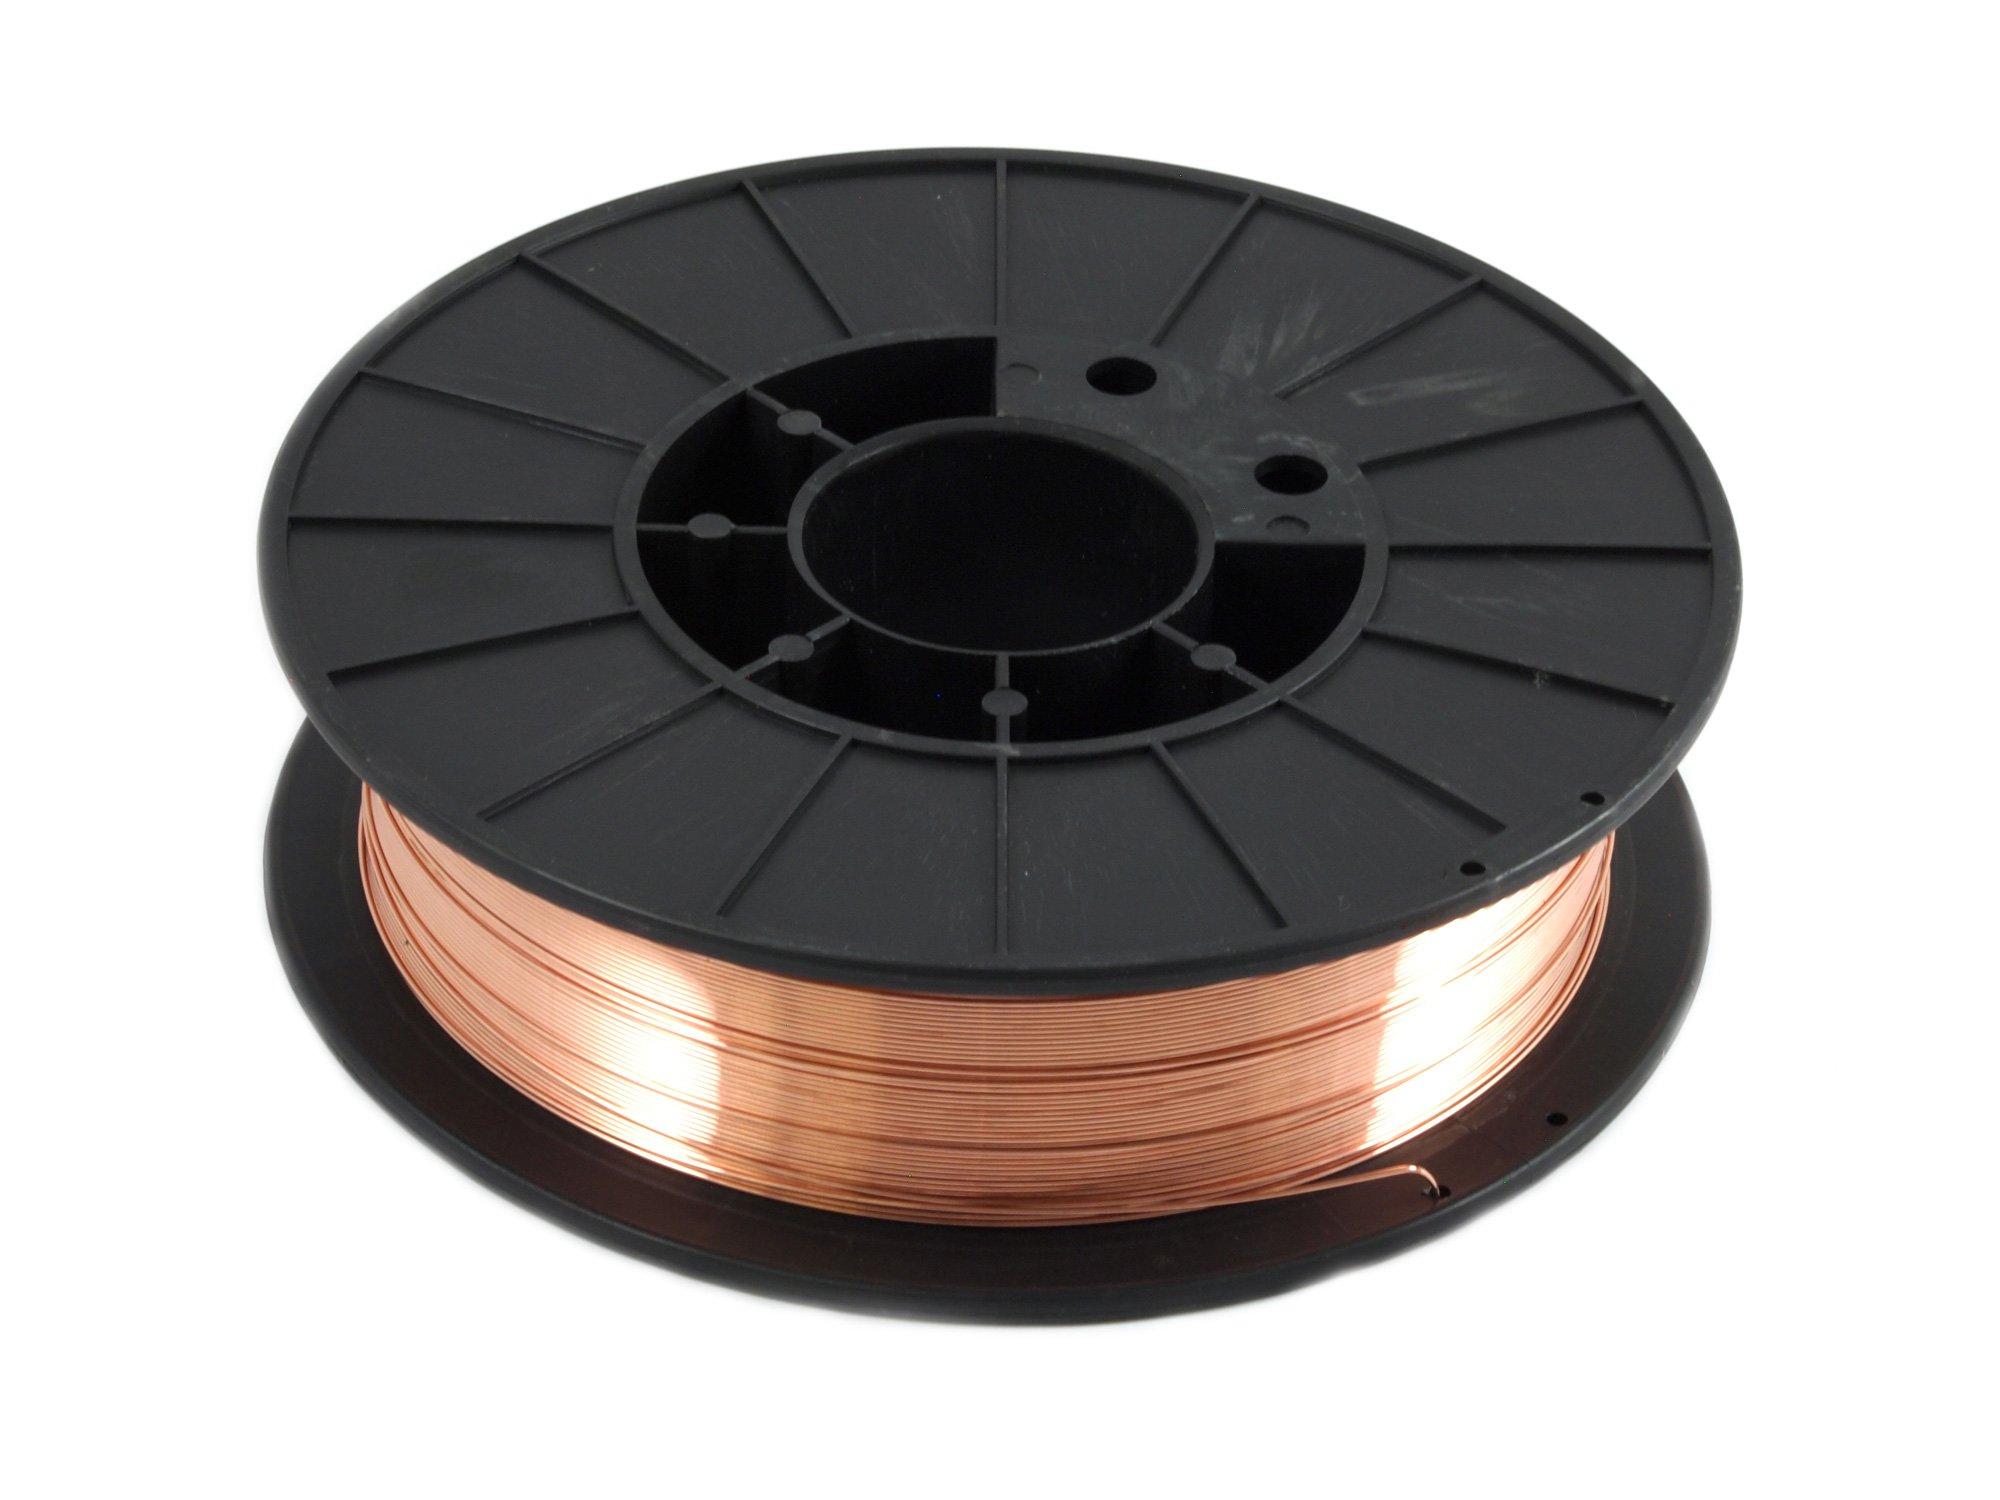 Forney 42287 Mig Wire, Mild Steel ER70S-6.035-Diameter, 10-Pound Spool